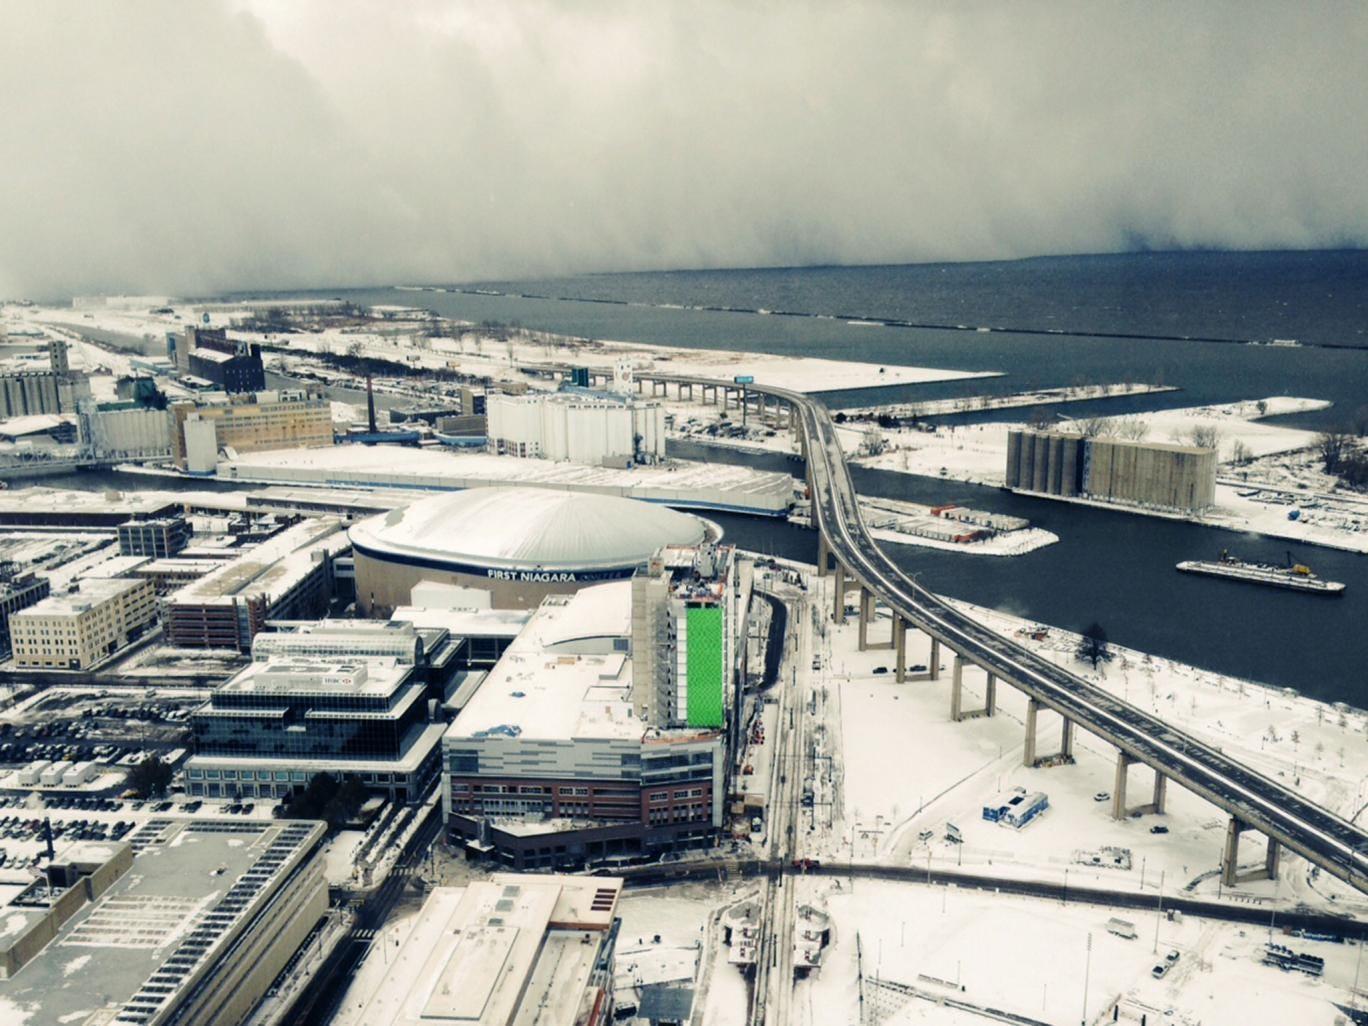 Watch Watch Snow Blanket Buffalo, NY, in Breathtaking Time-Lapse Video video